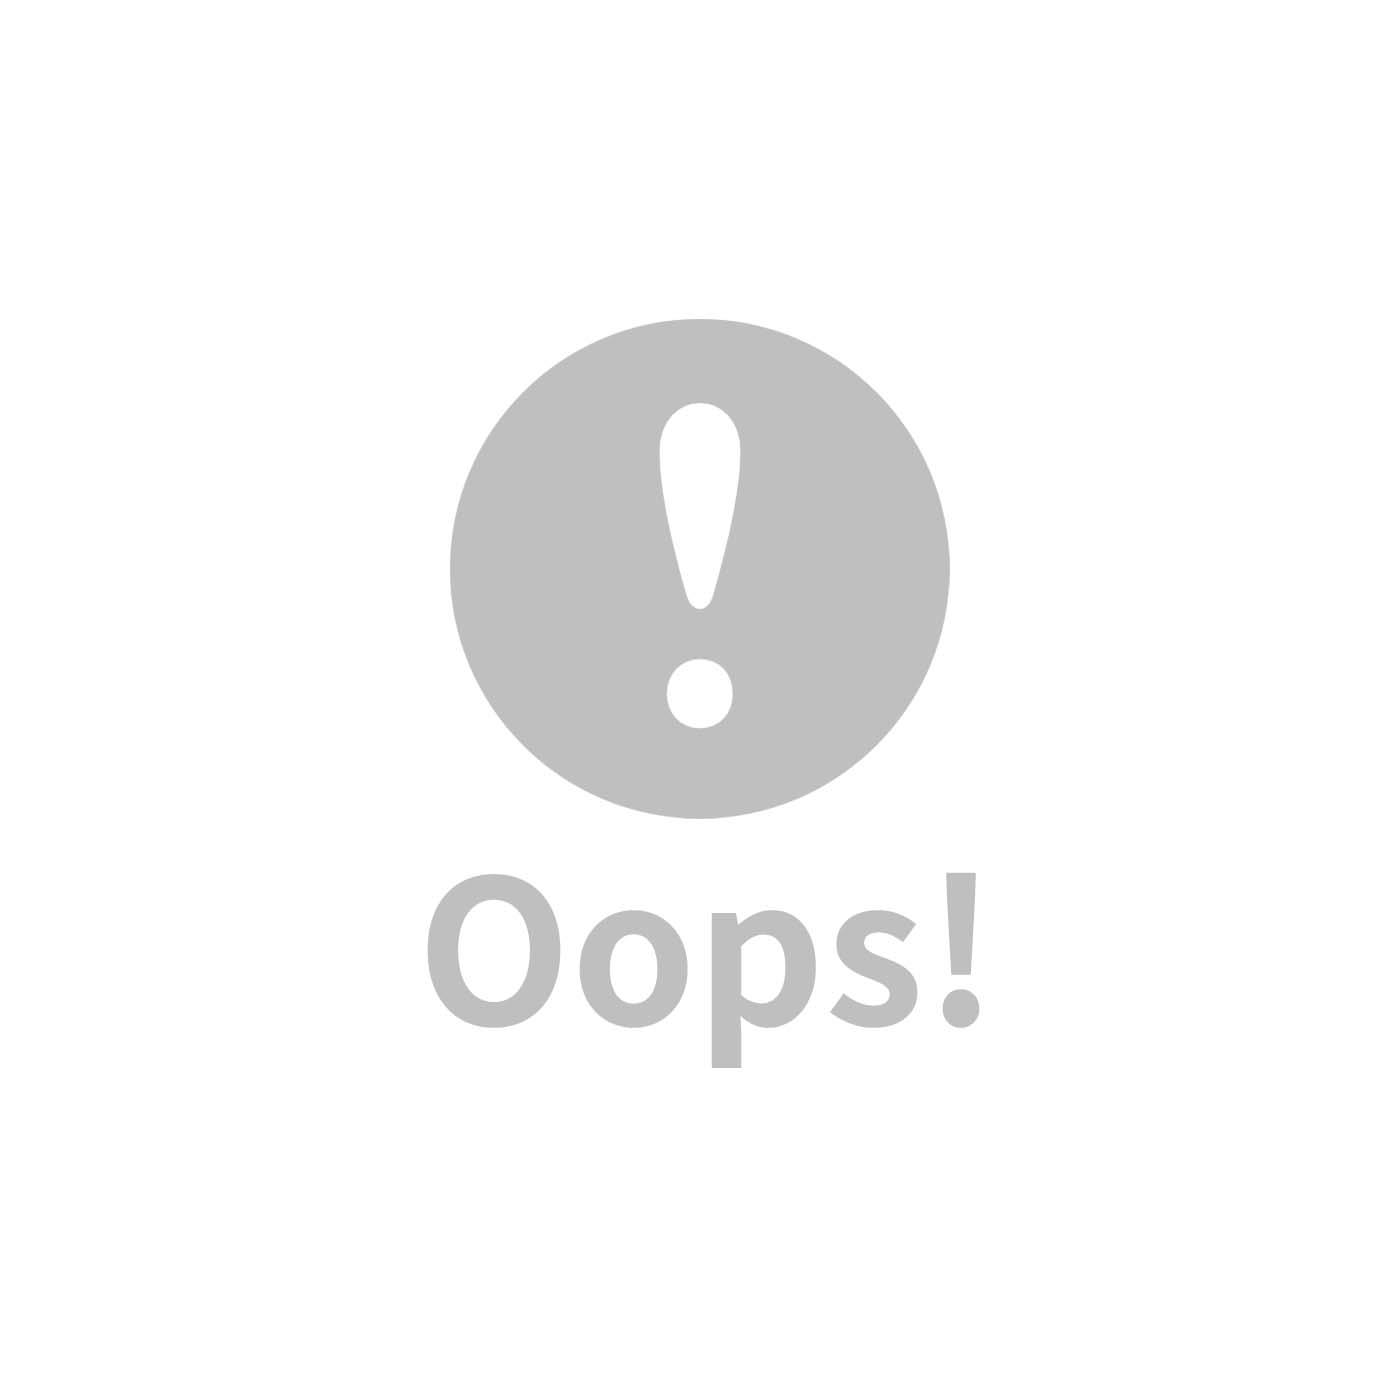 global affairs 童話手工編織安撫搖鈴_動物派對2(小獅王)